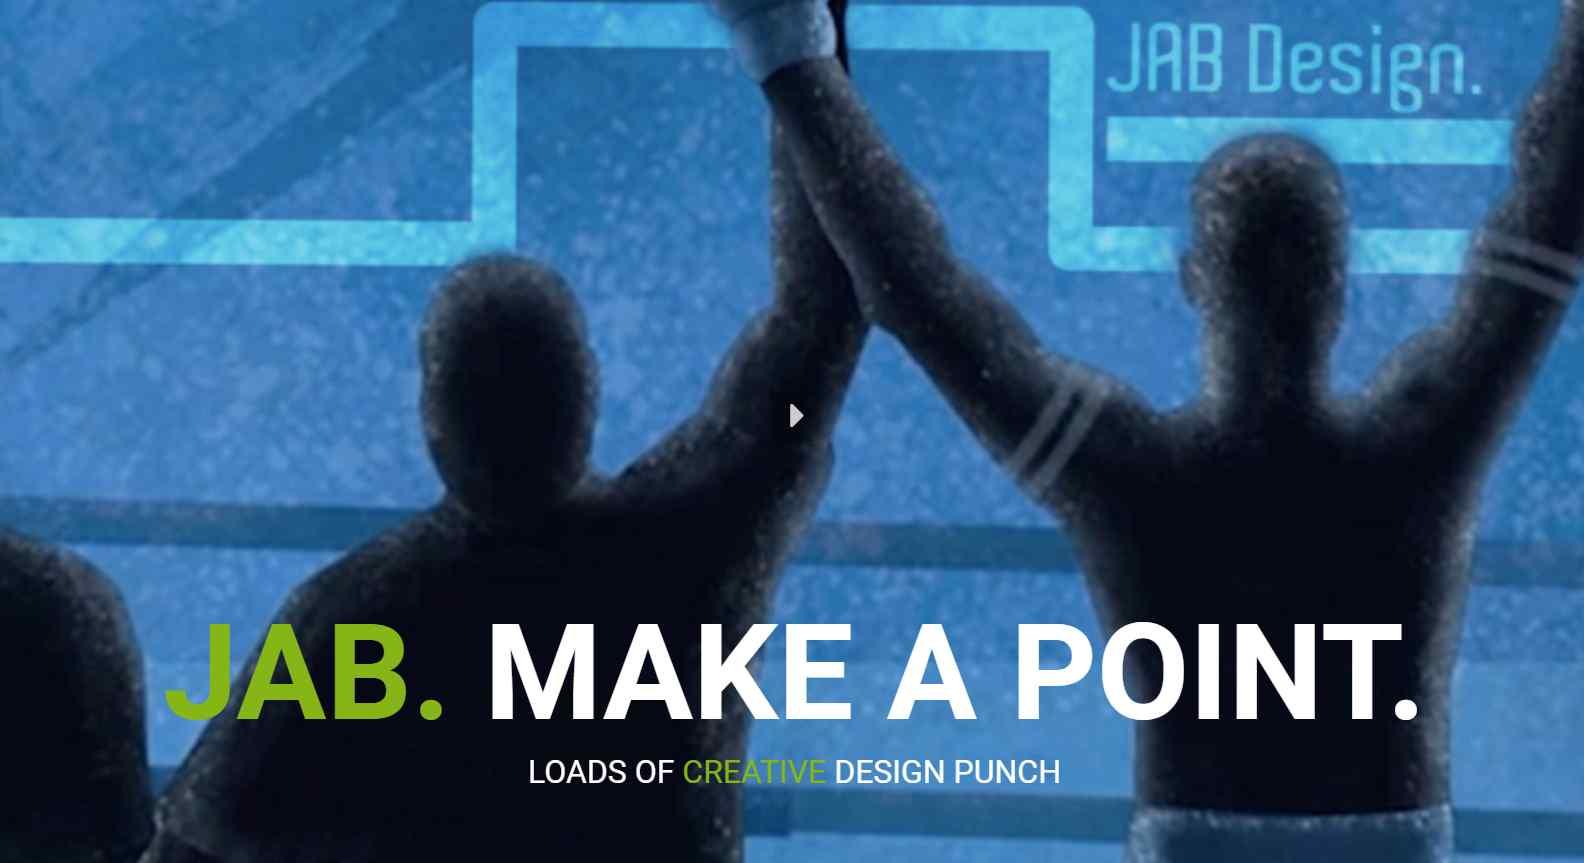 jab Top Digital Design Agencies in Singapore